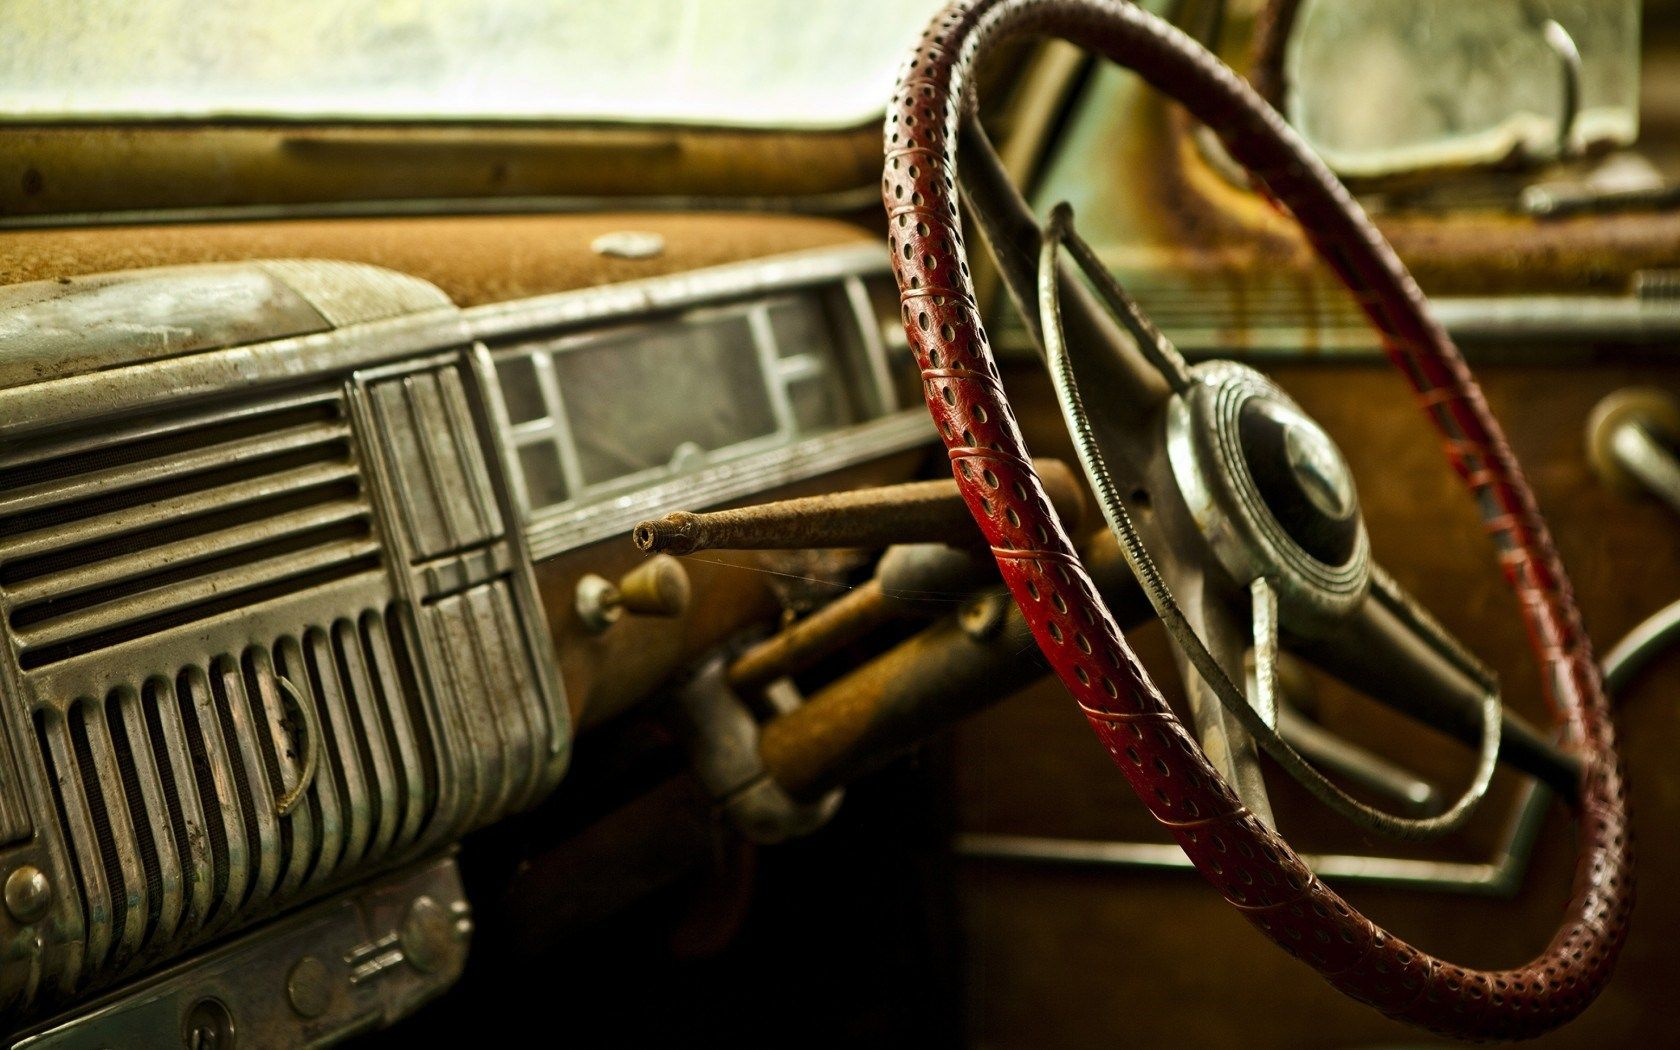 Classic Car Interior Wallpaper 36889 Retro Background Vintage Cars Car Wallpapers